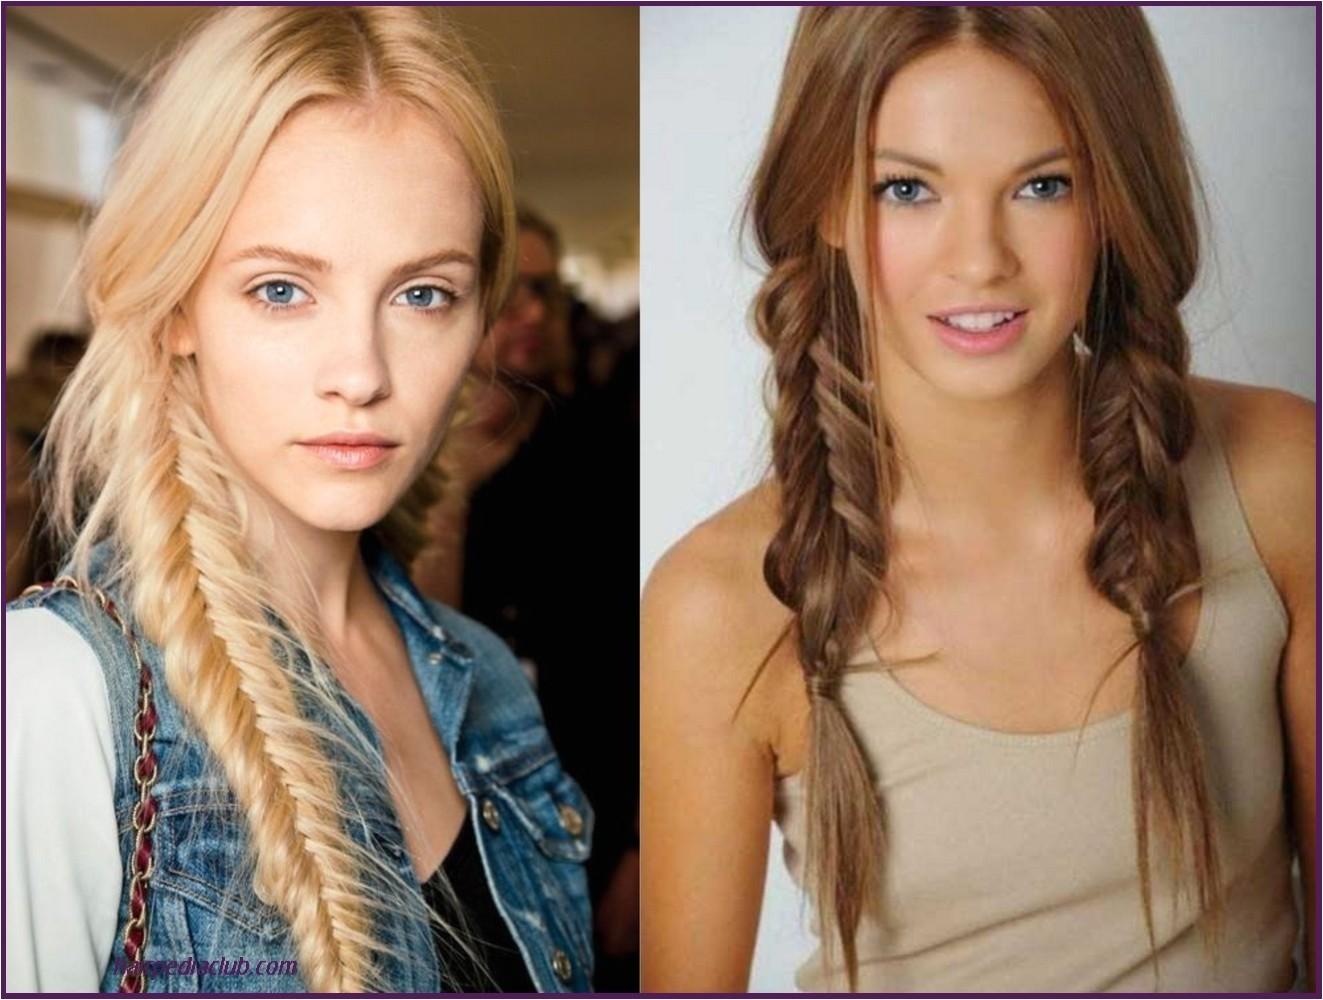 school hairstyles for shoulder length hair 5 hairstyles shoulder length hair for school going girls